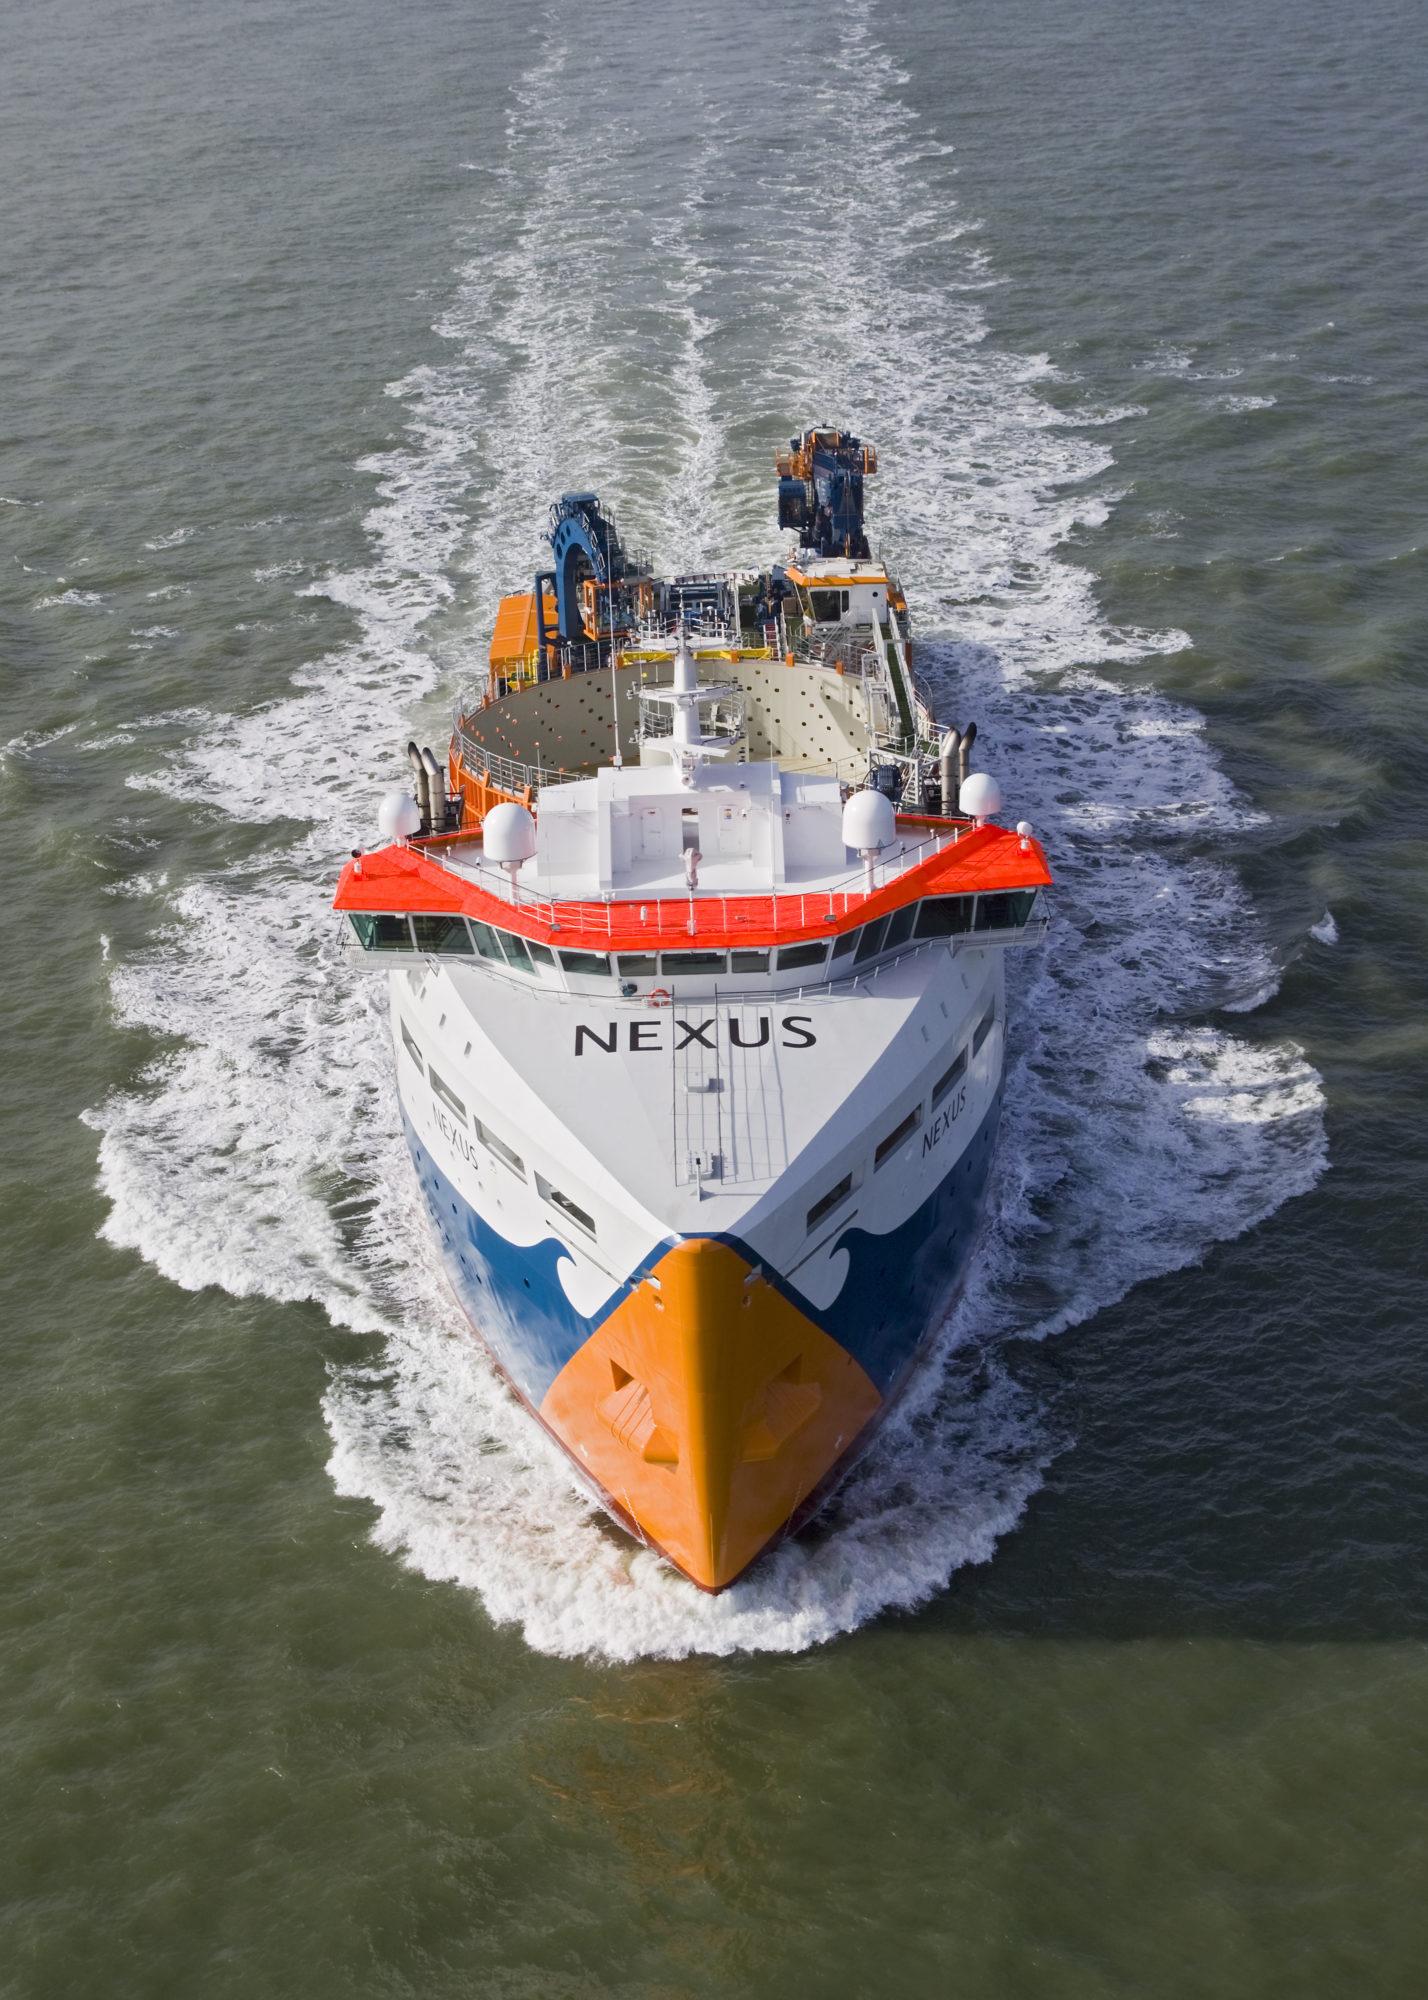 Maritime Archieven Ergos